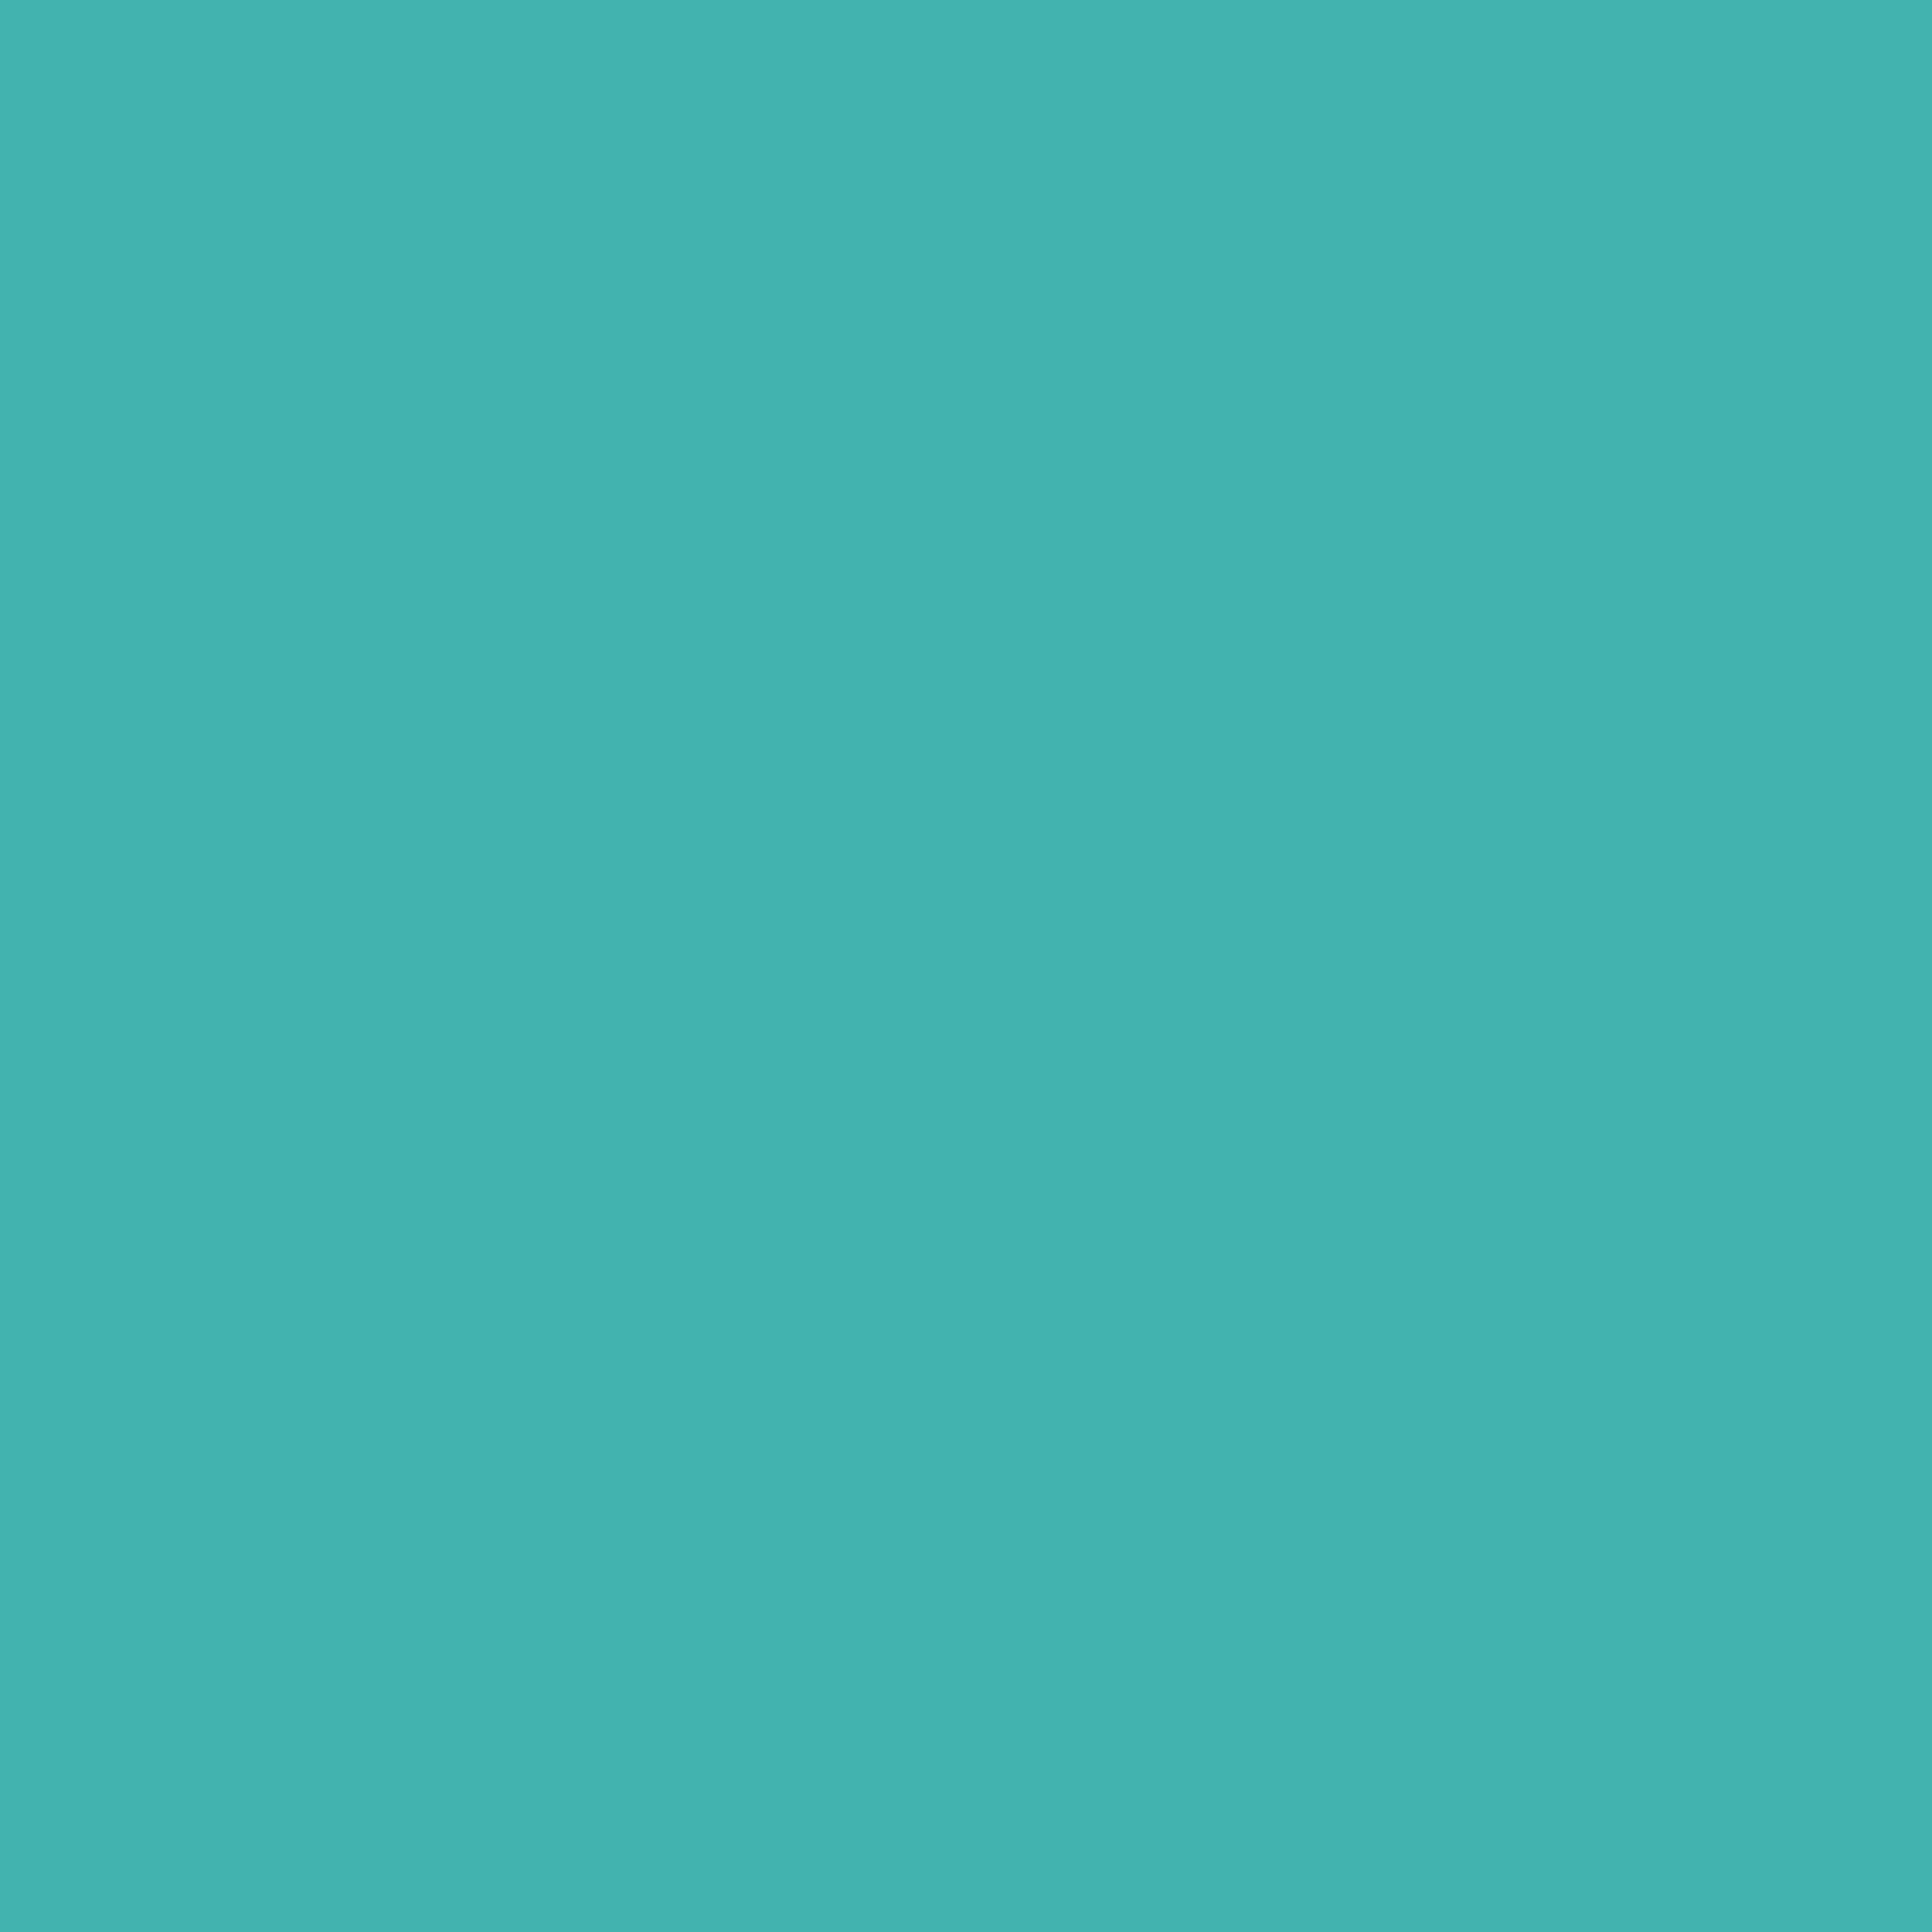 2048x2048 Verdigris Solid Color Background